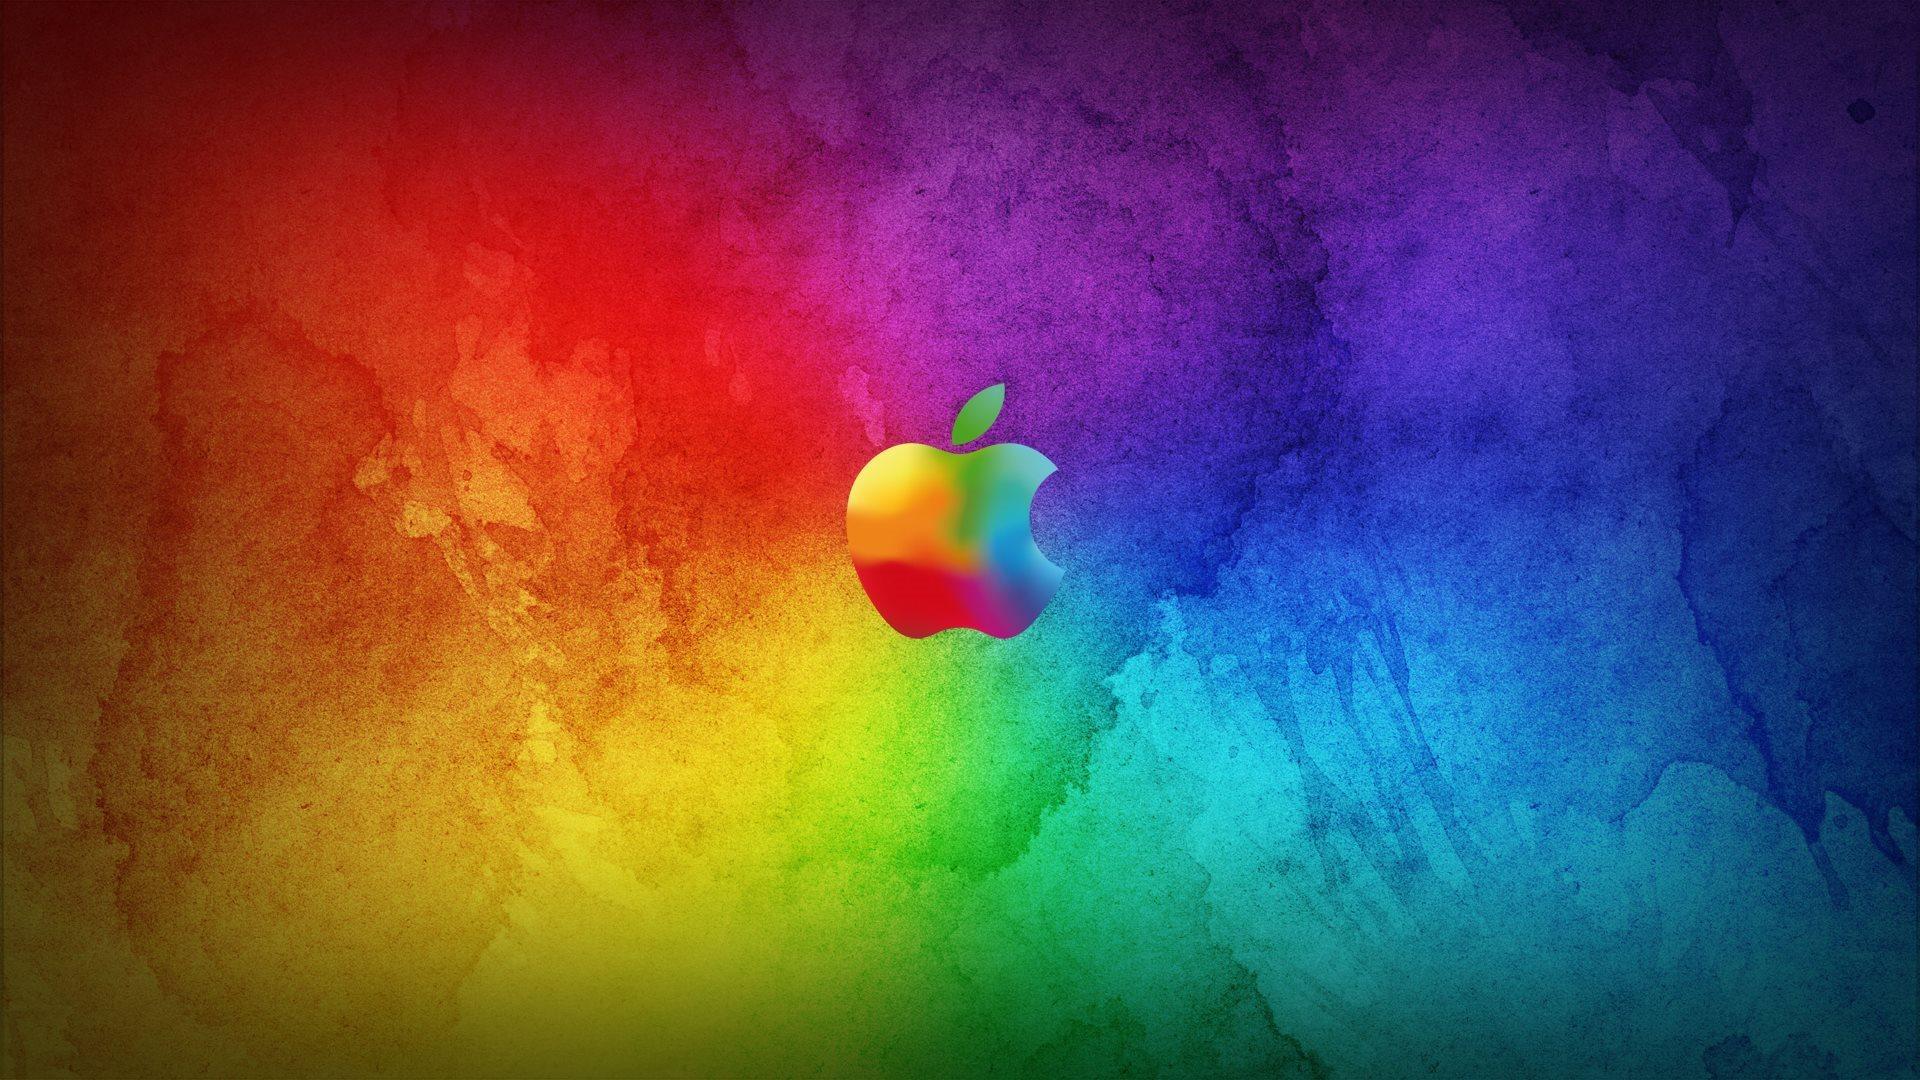 Apple Logo Wallpapers Desktop HD Wallpaper of Logo 1920x1080